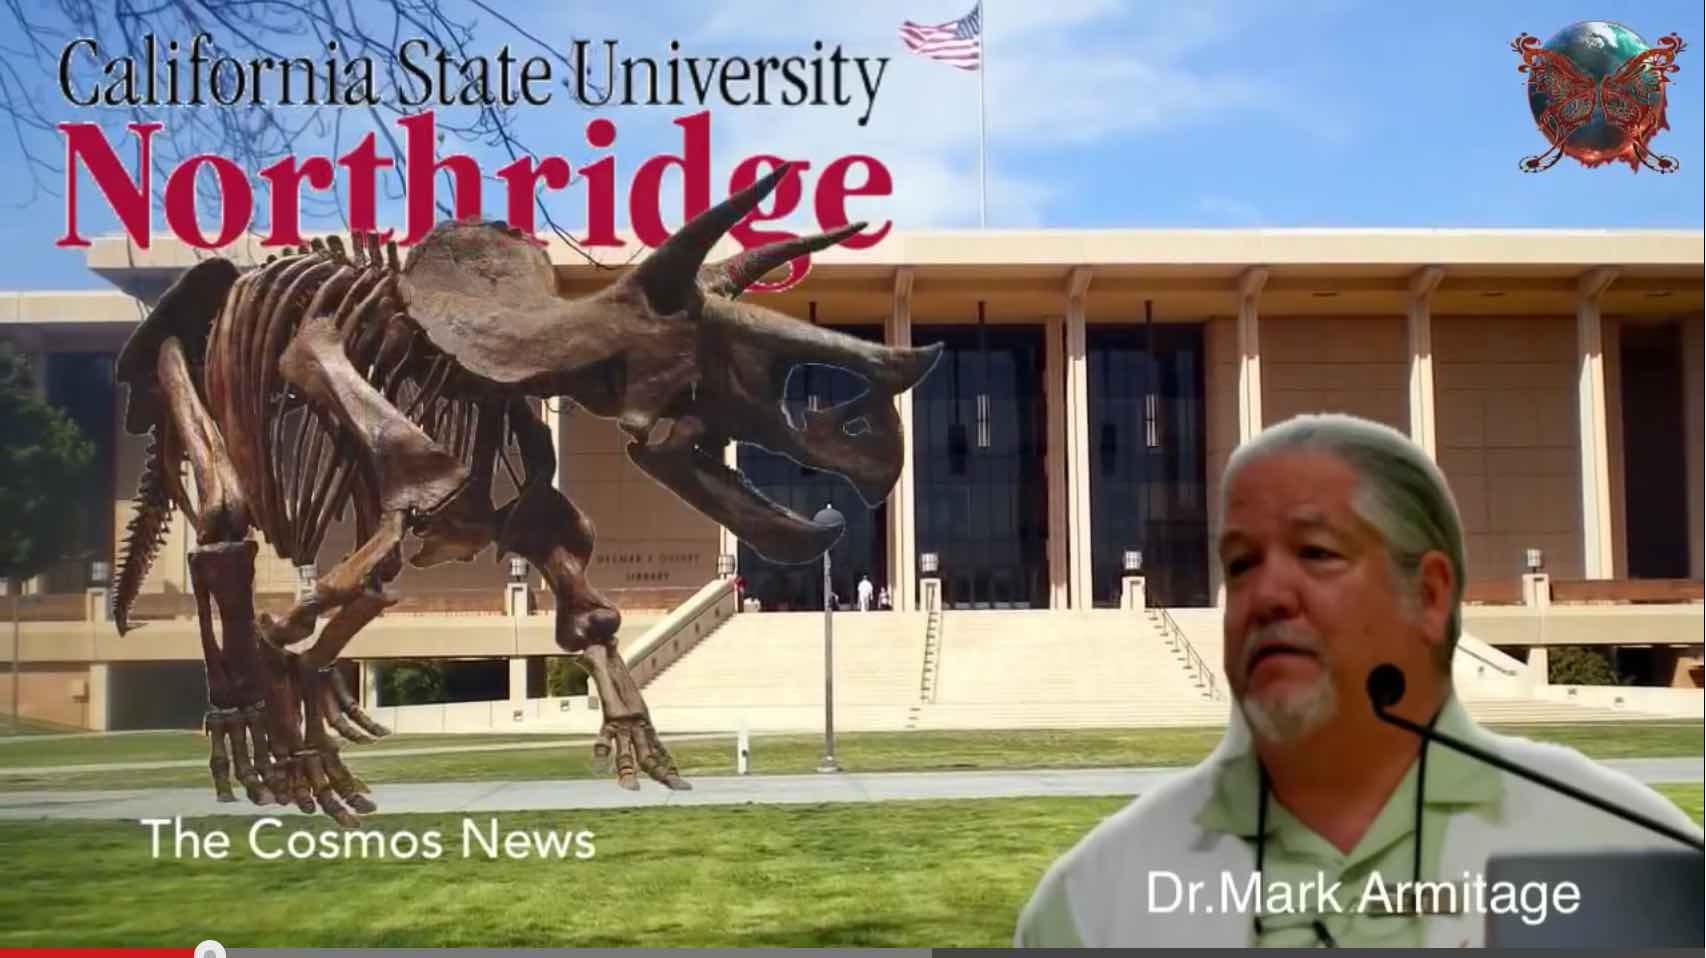 Armitage_triceratops_sc.jpg